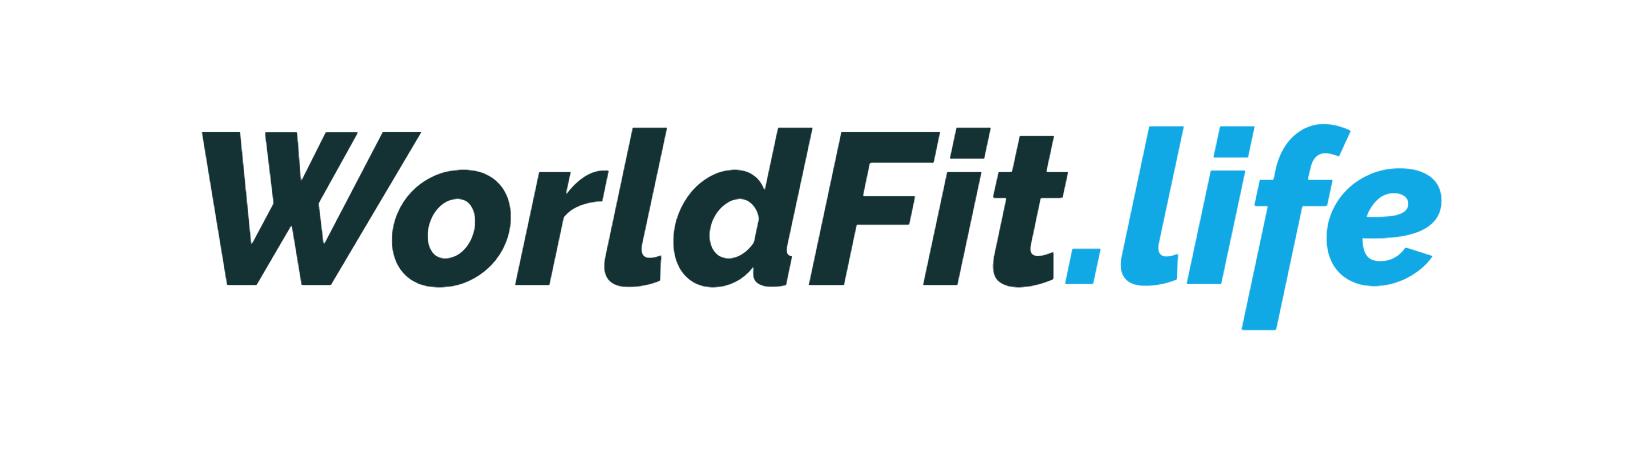 Worldfit.life